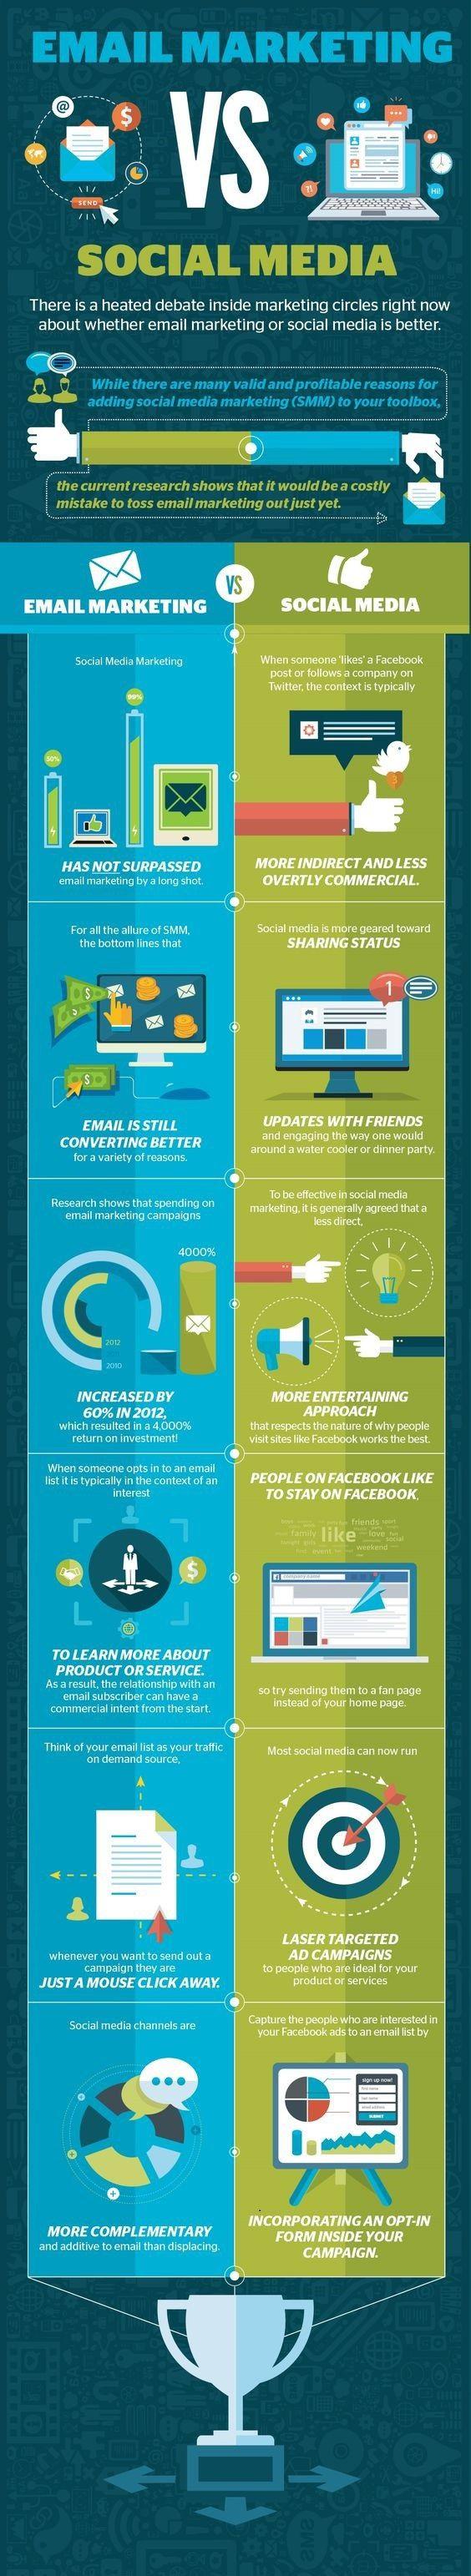 E-mail marketing Vs Social Media Marketing  Infographic 2016